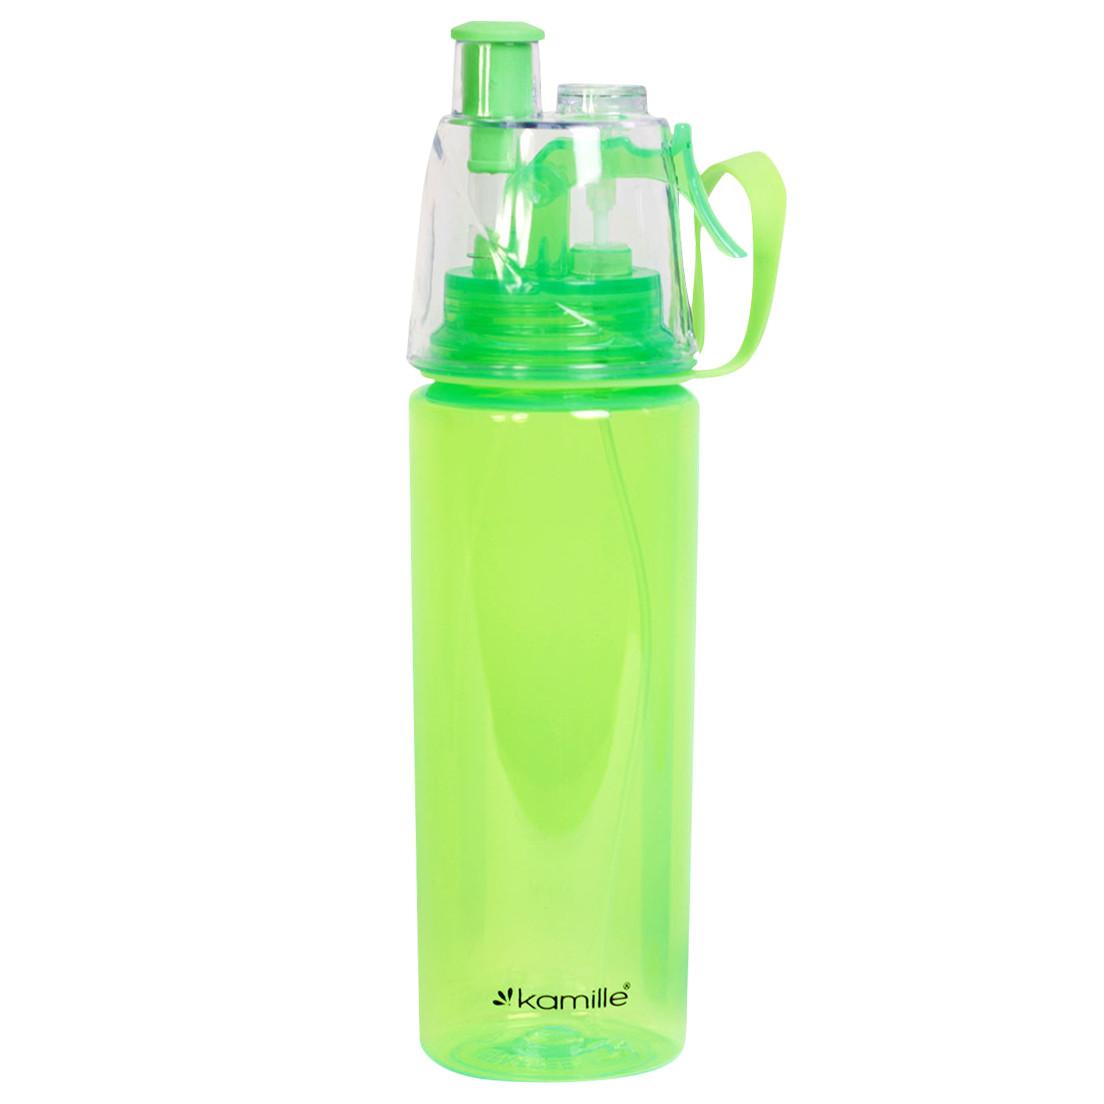 Бутылка спортивная для воды Kamille Зеленый 570мл из пластика KM-2301ZL